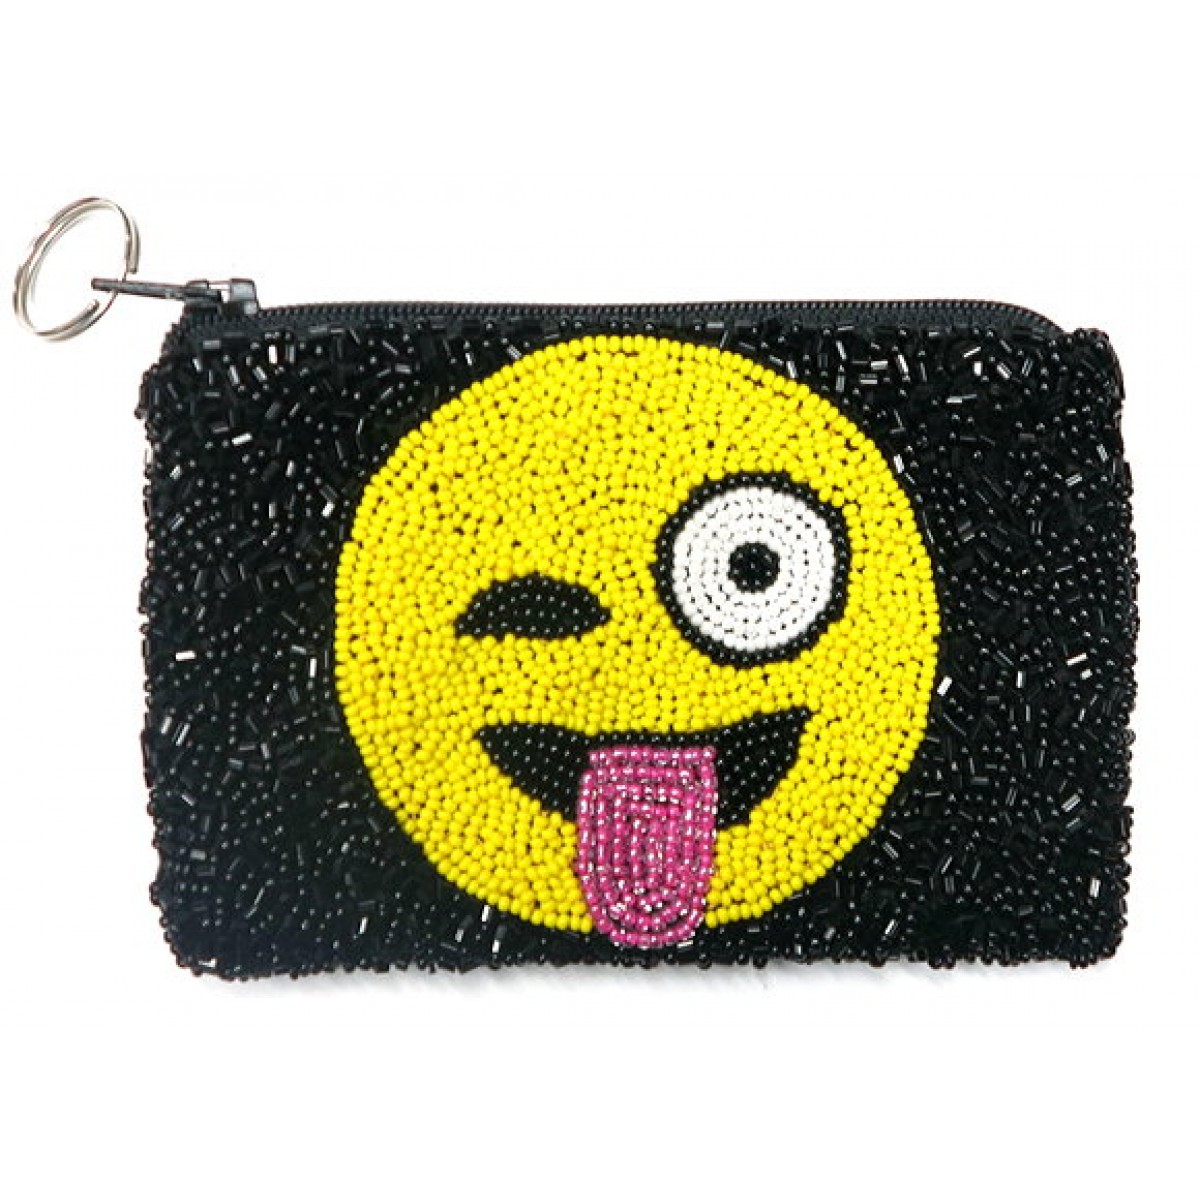 Tongue Out Emoji Coin Purse